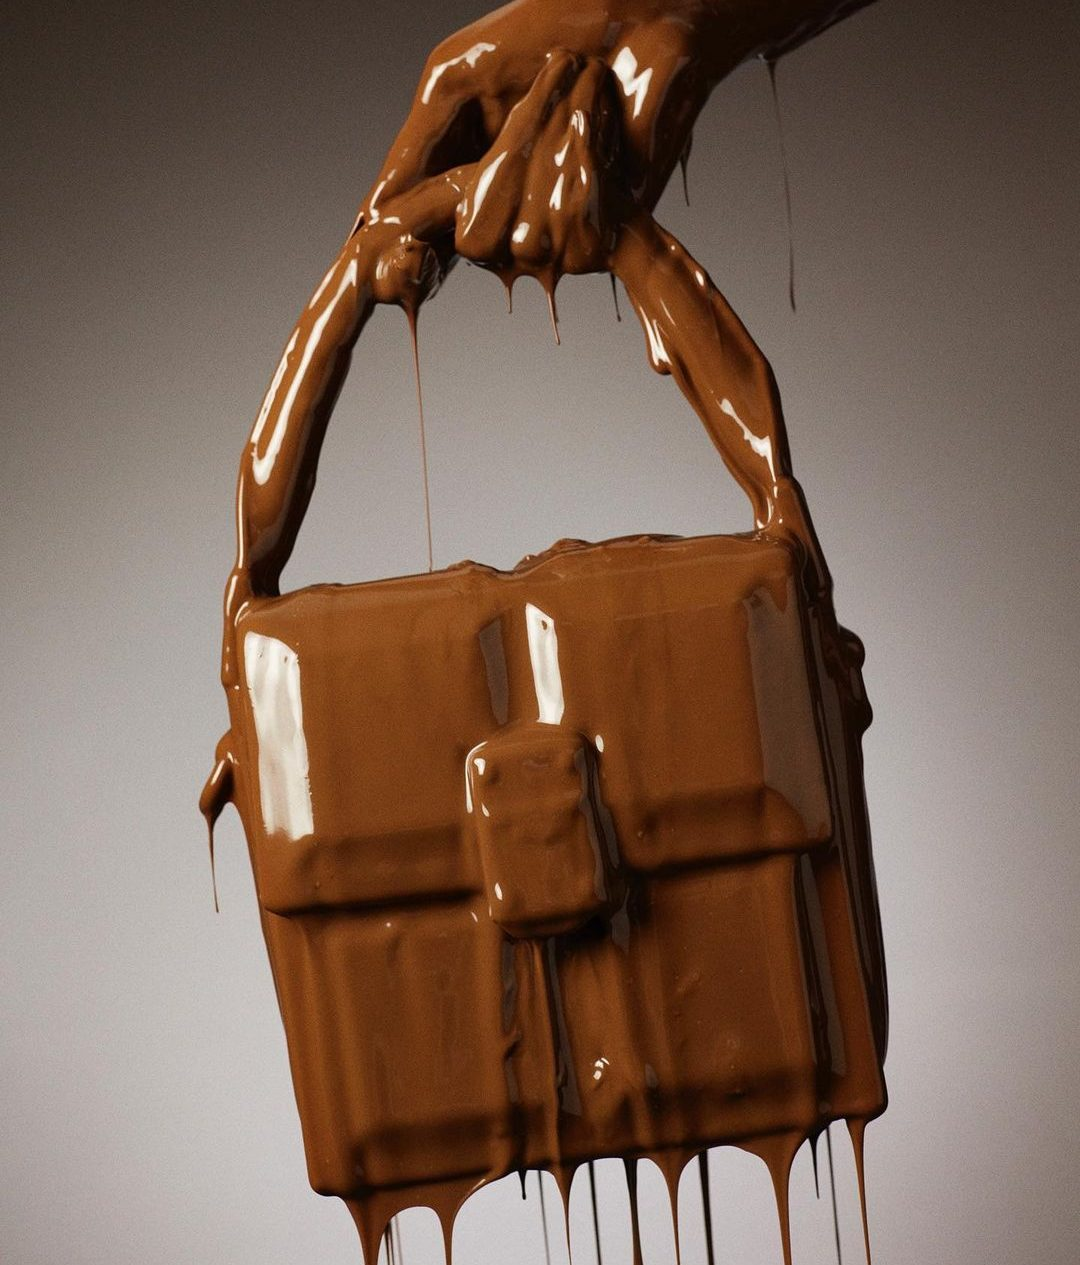 Balmain launches new handbag collection - Le Chocolat